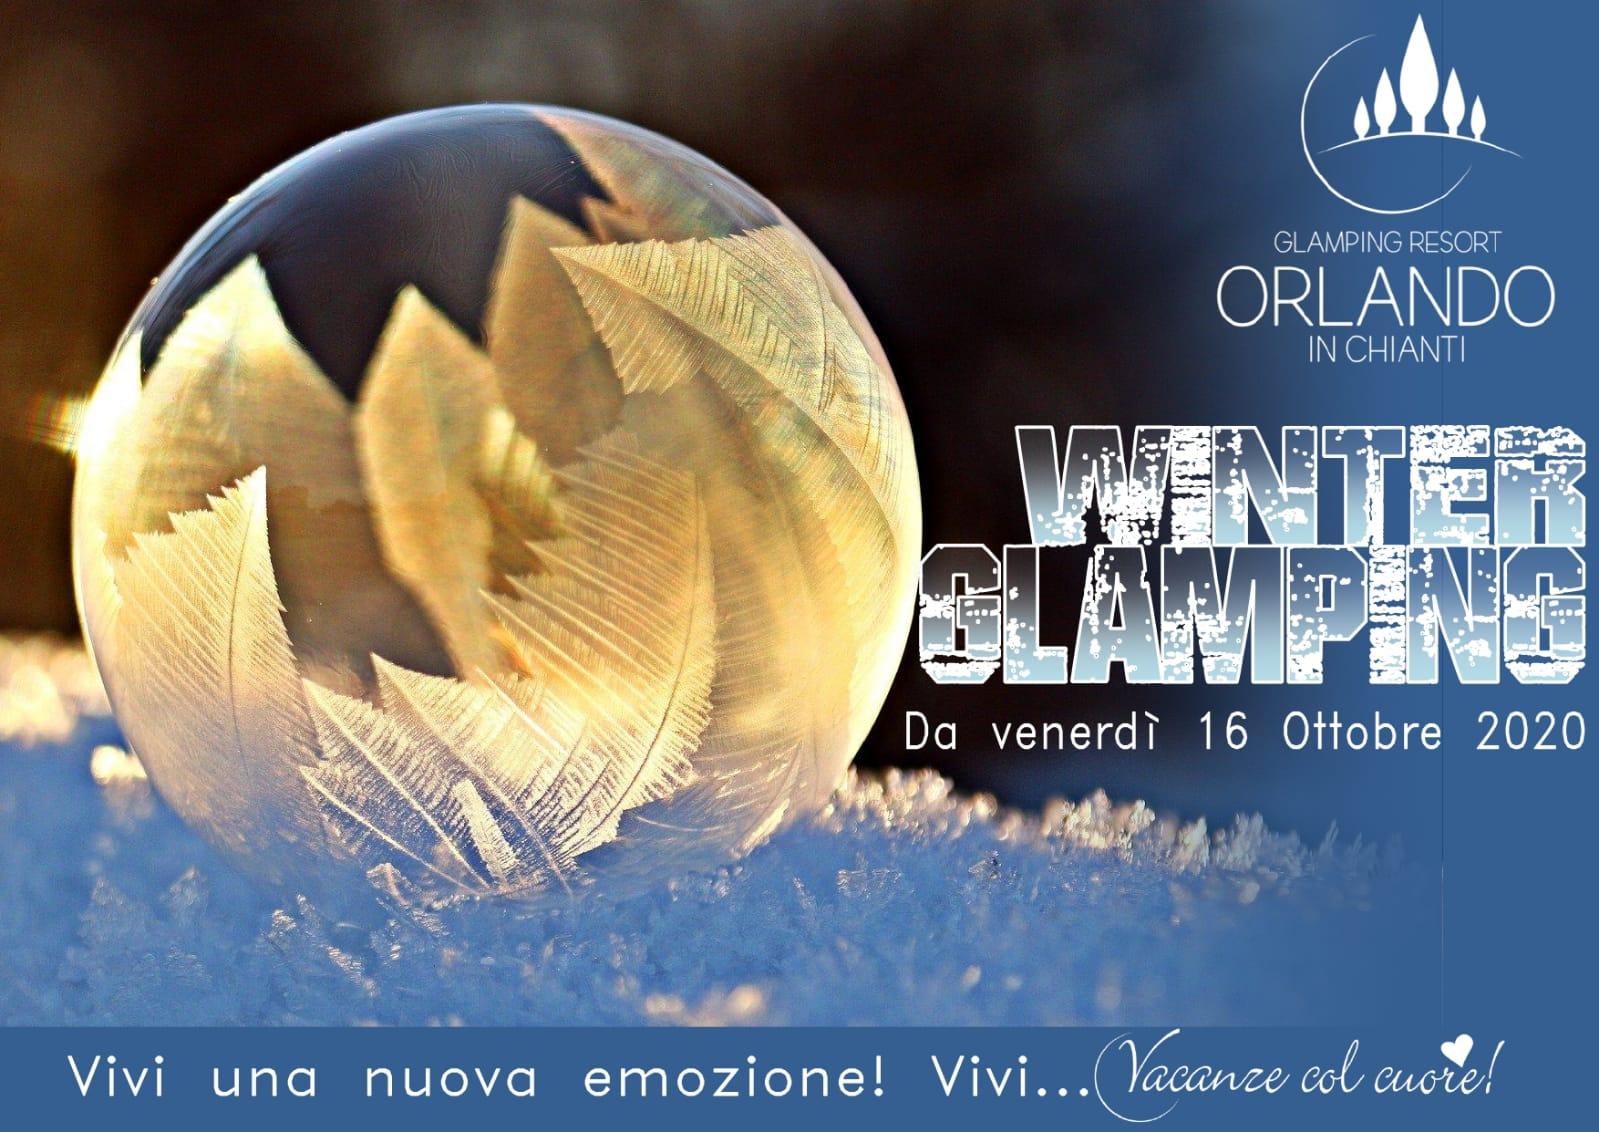 Orlando in Chianti Winter Glamping  | Opening soon